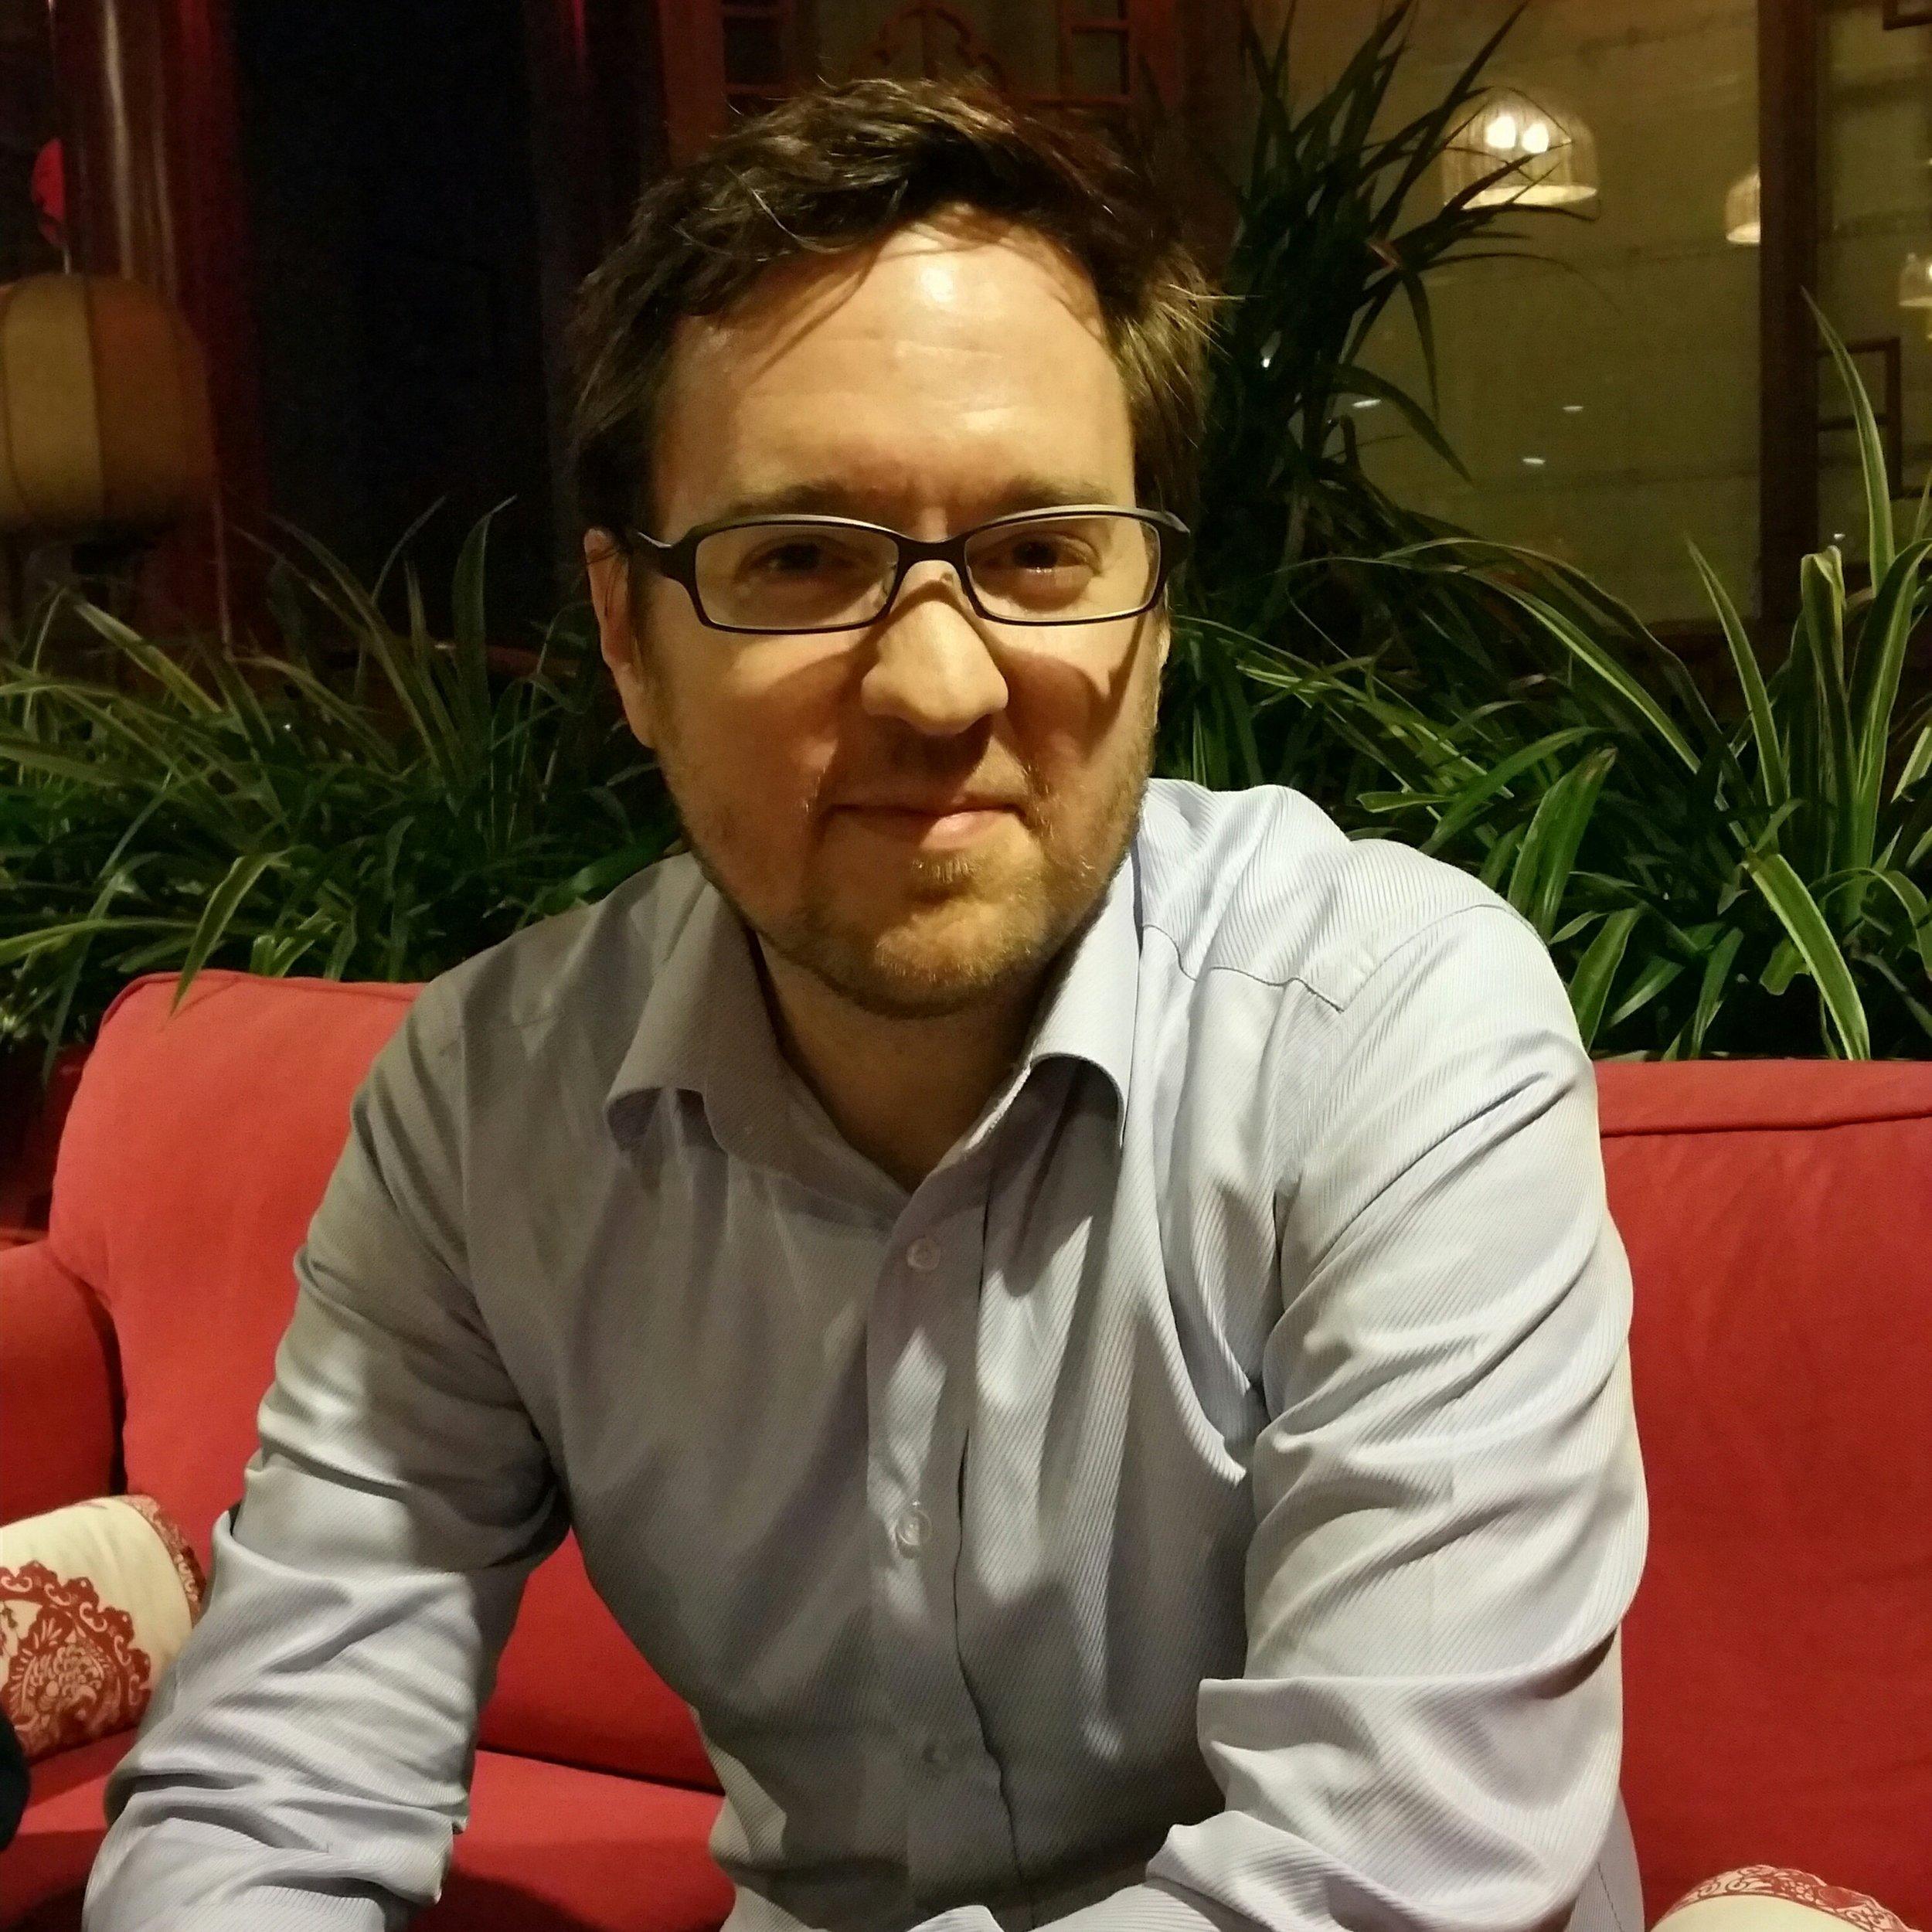 Christian Grewell - M3diate Creative Lead